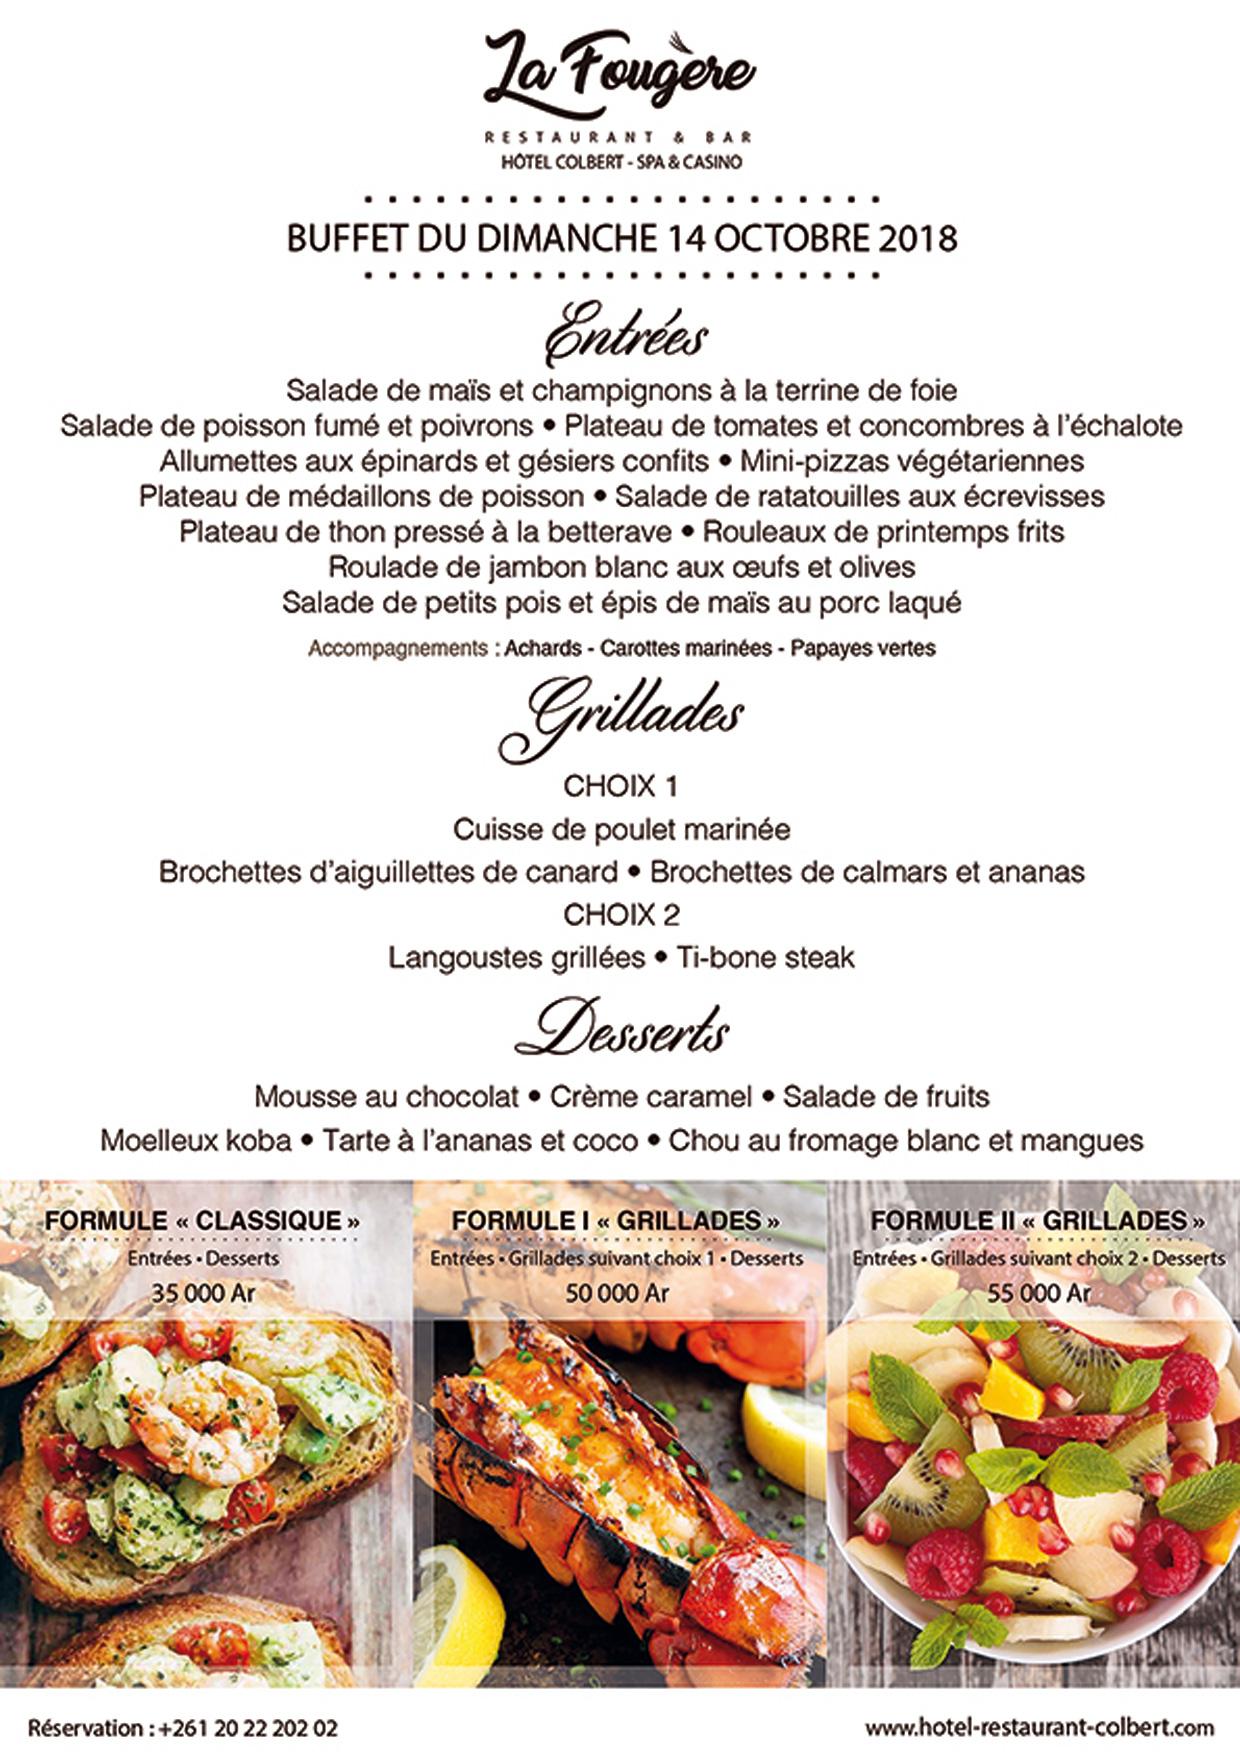 La Fougère: Sunday, October 14, 2018 buffet